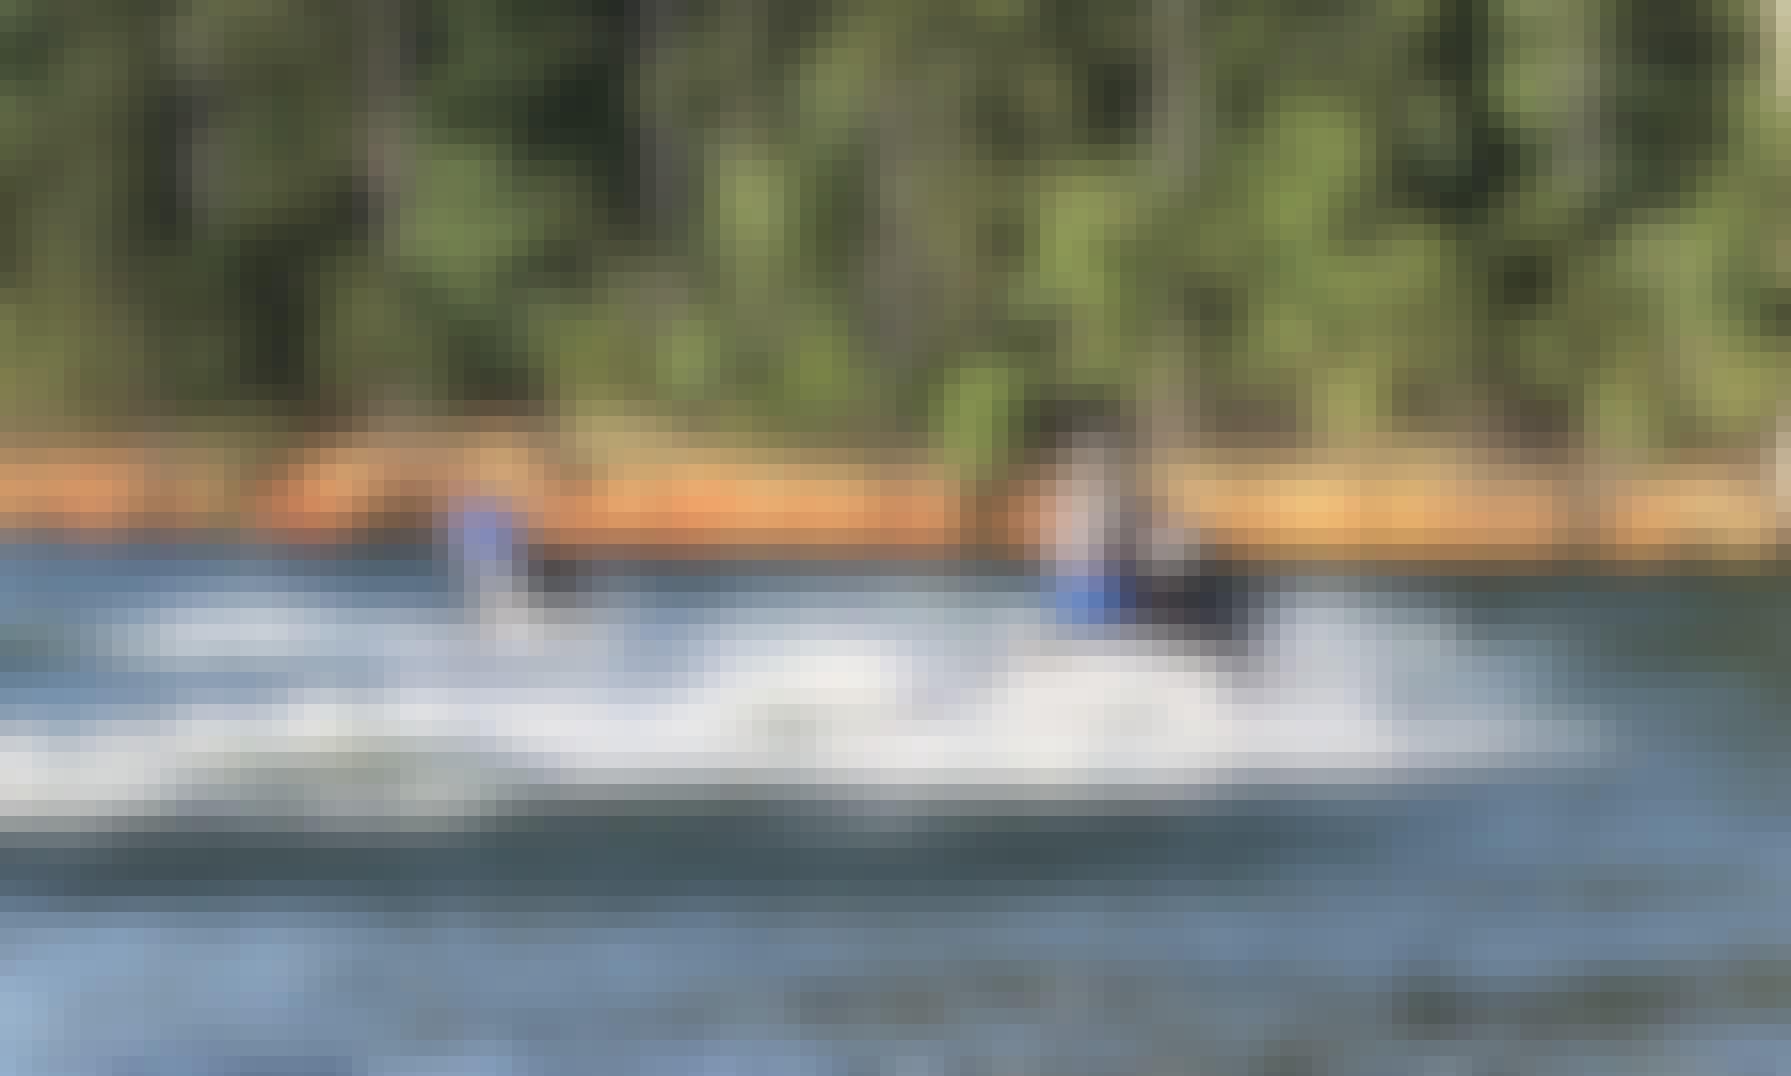 10 ft Seadoo Spark Jet Ski Rental in Acworth, Georgia